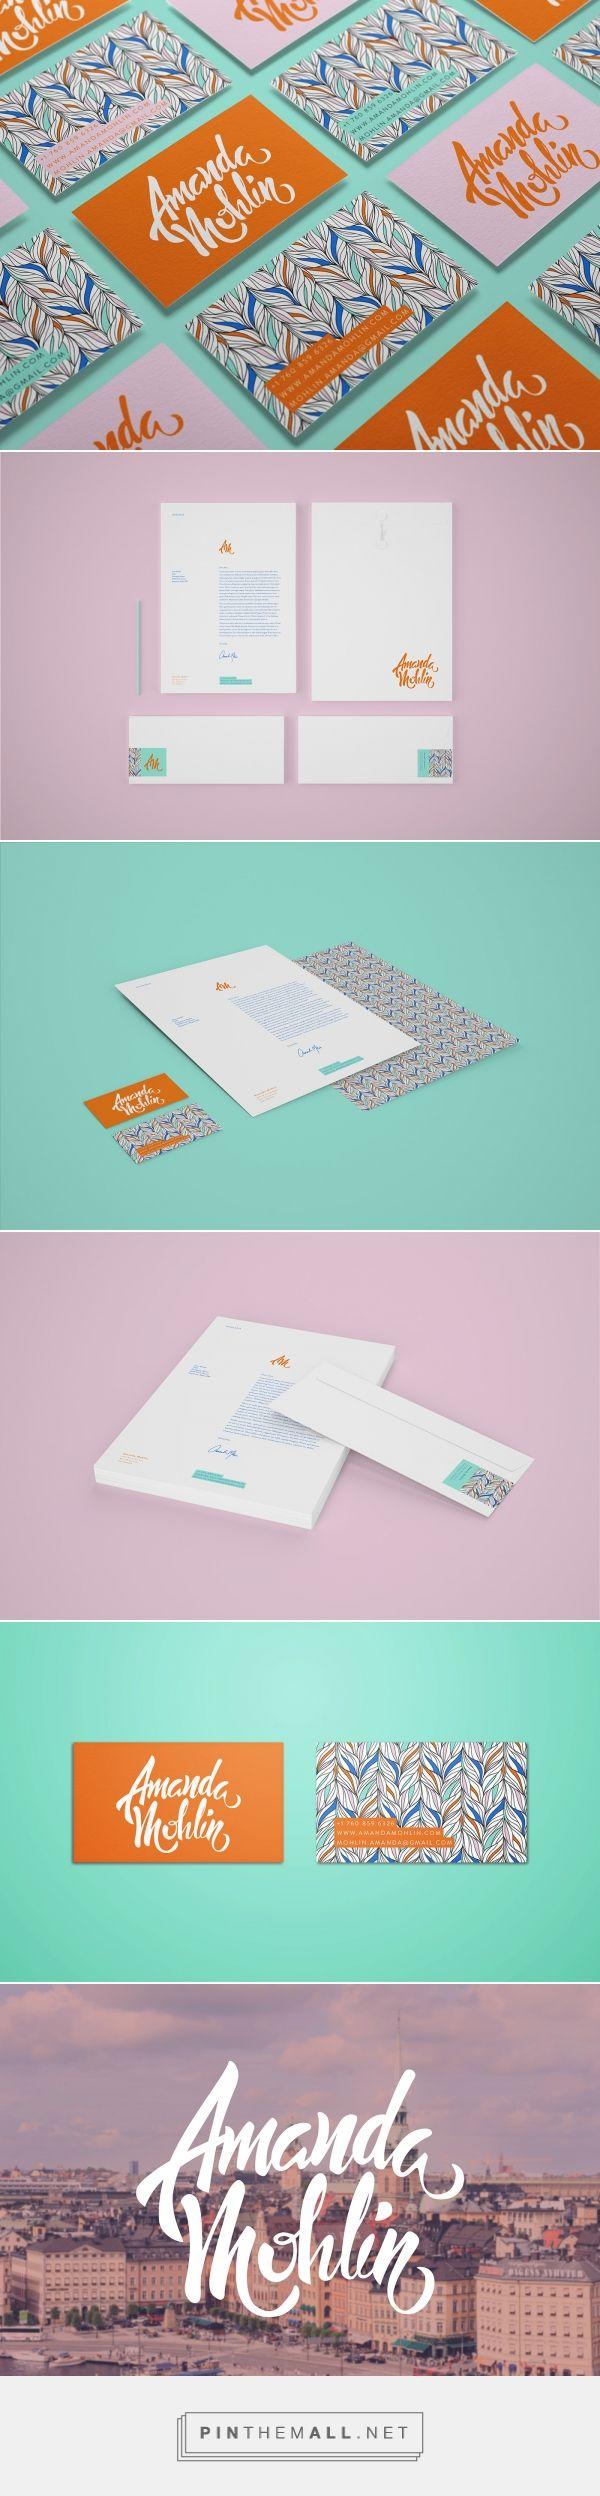 Personal Branding 2014 on Behance - created via https://pinthemall.net